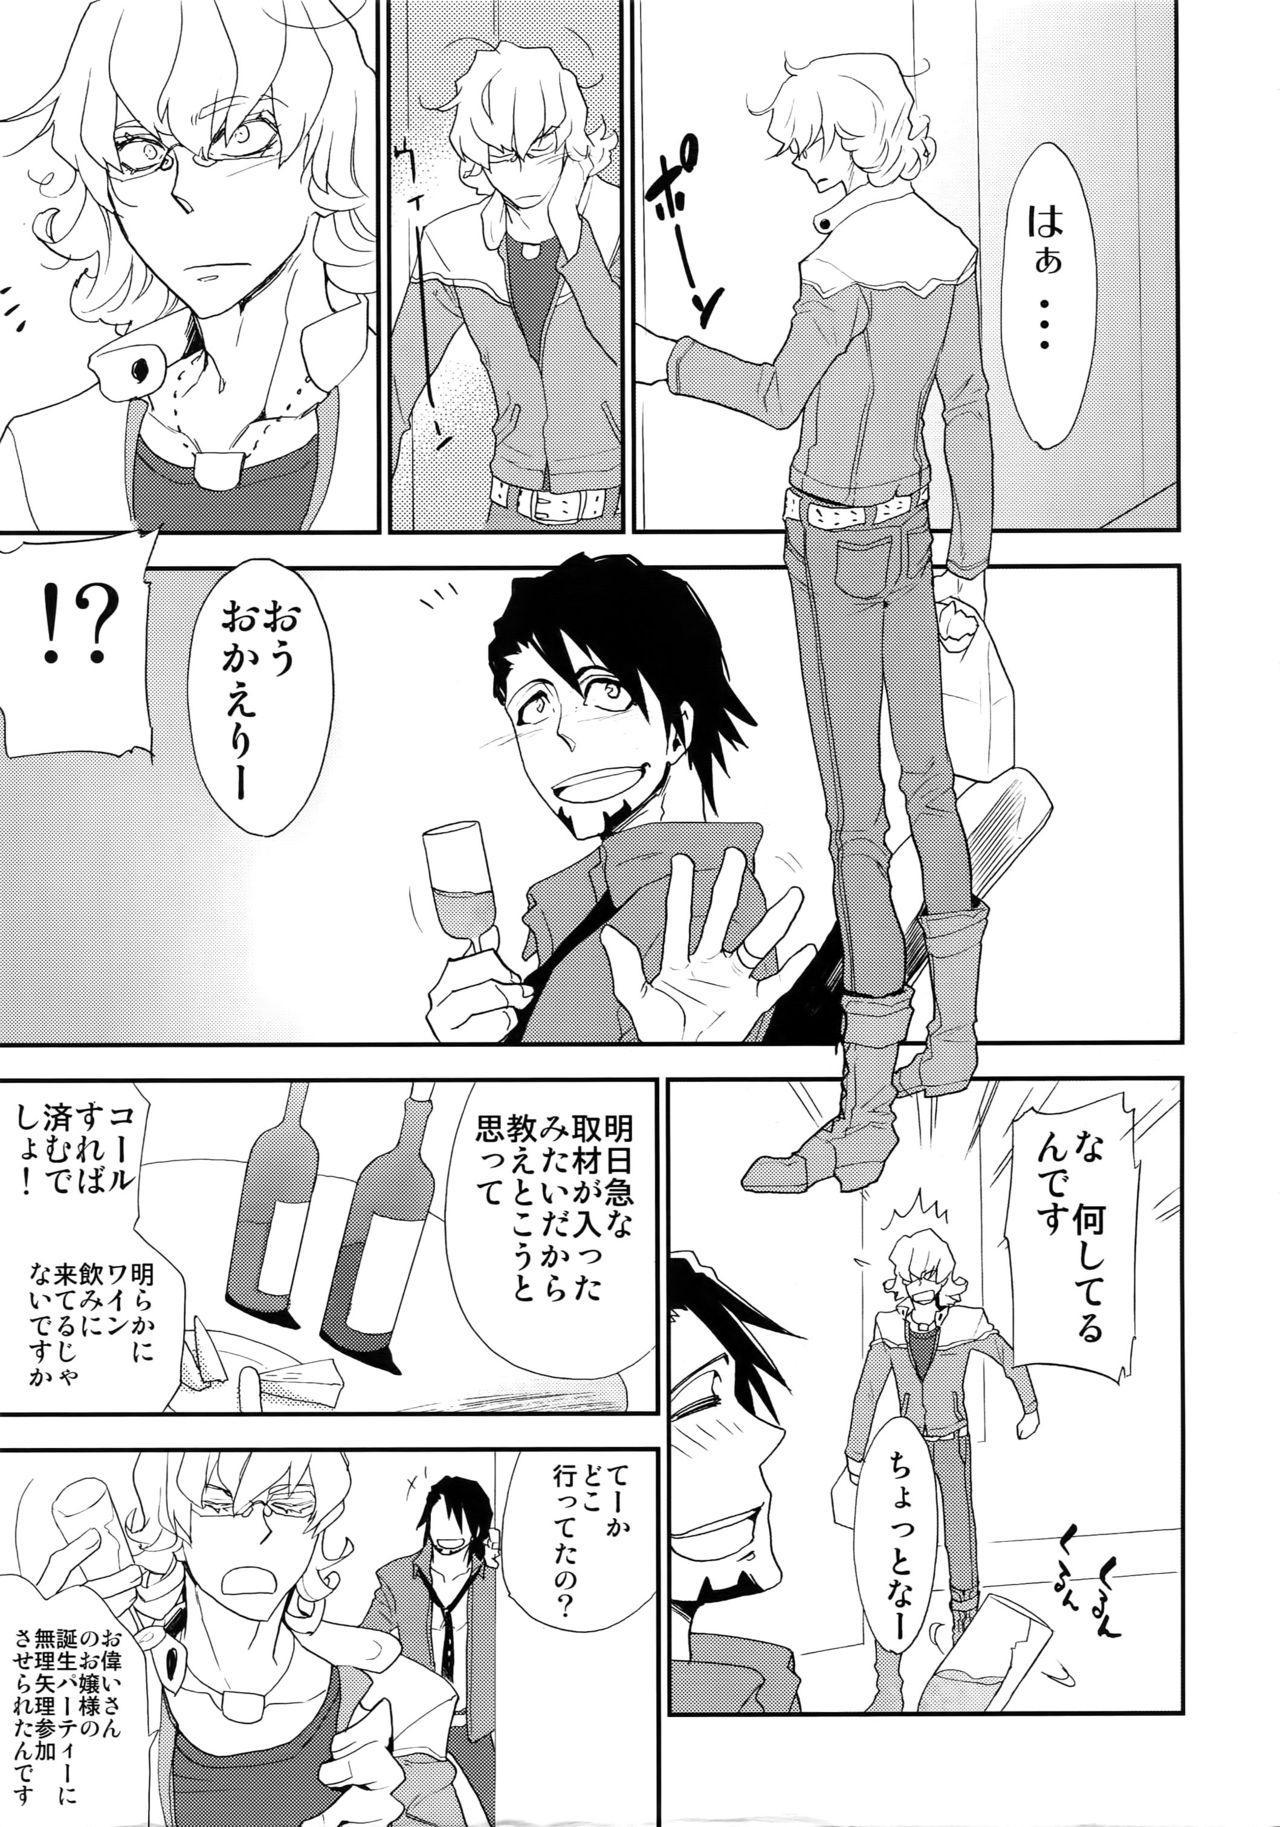 T&B Sairoku! 5